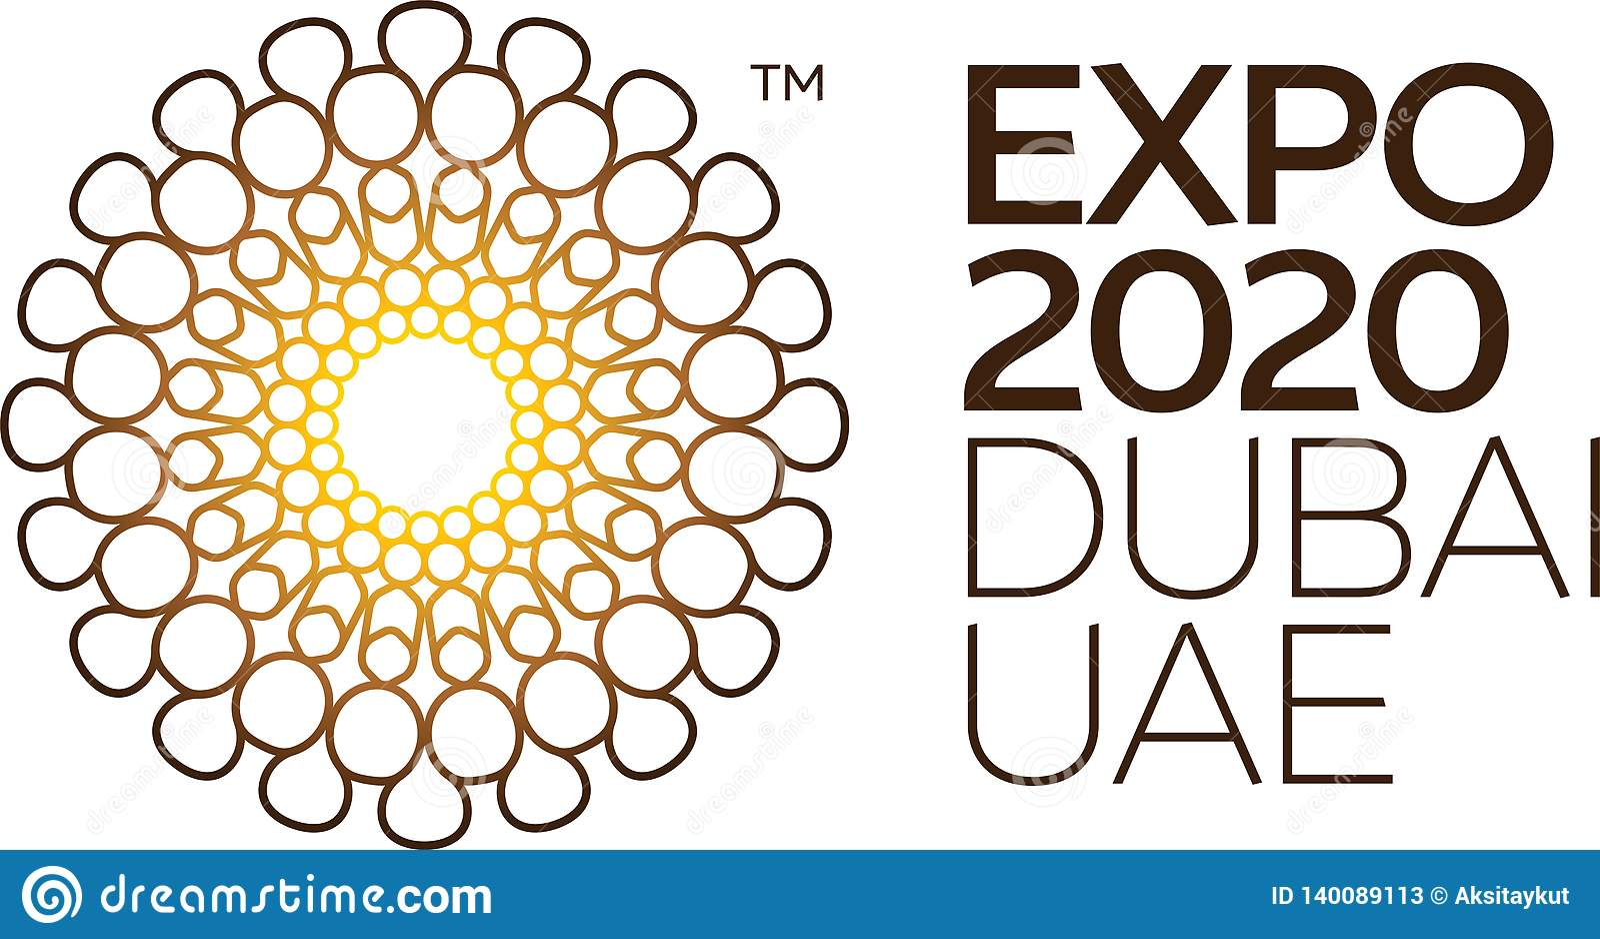 Expo 2020 Uae Editorial Stock Photo Illustration Of Host 140089113